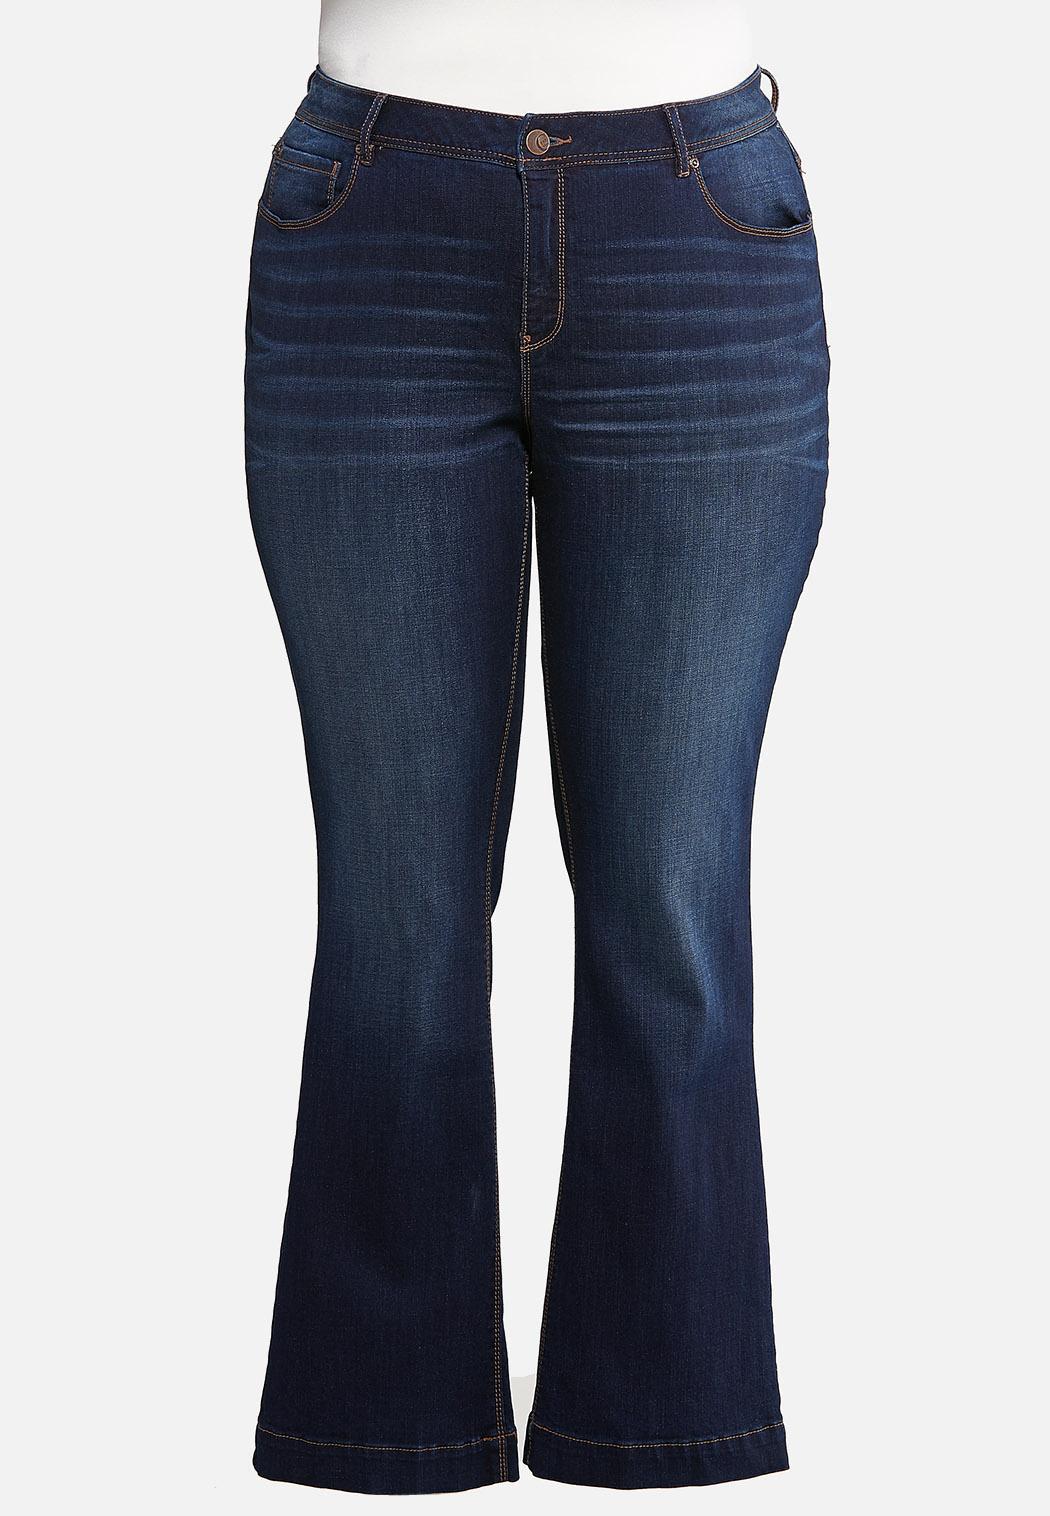 Plus Size Dark Bootcut Jeans